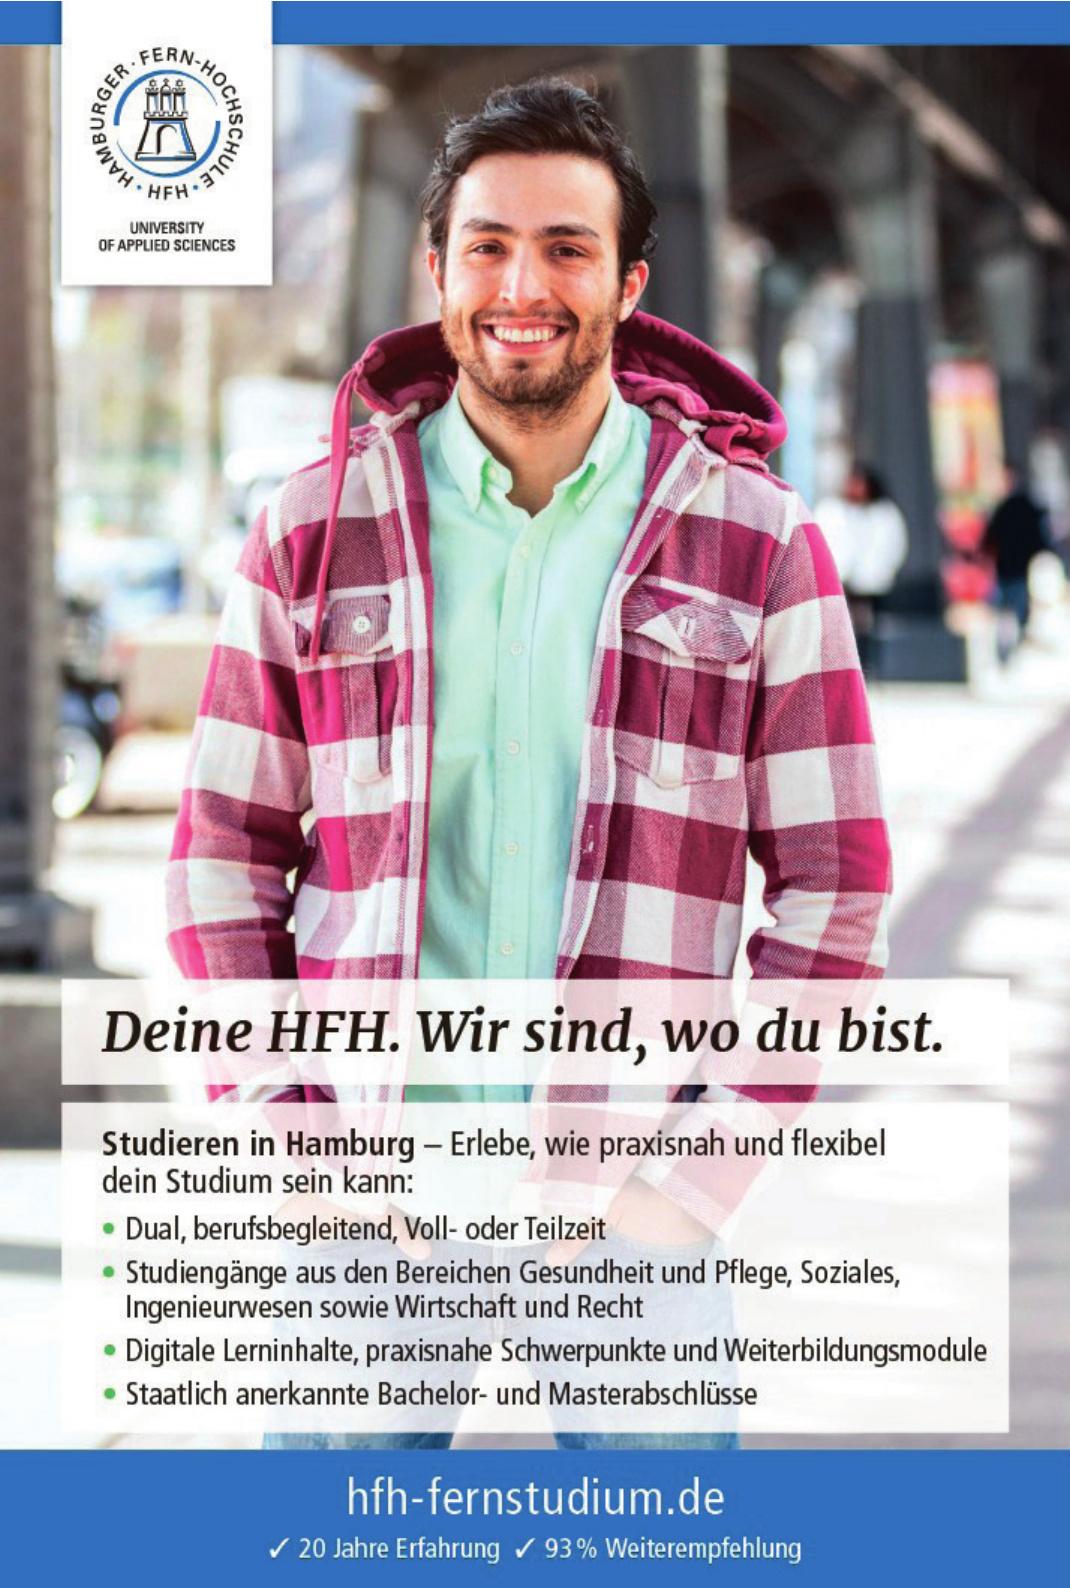 Hamburger Fern-Hochschule HFH